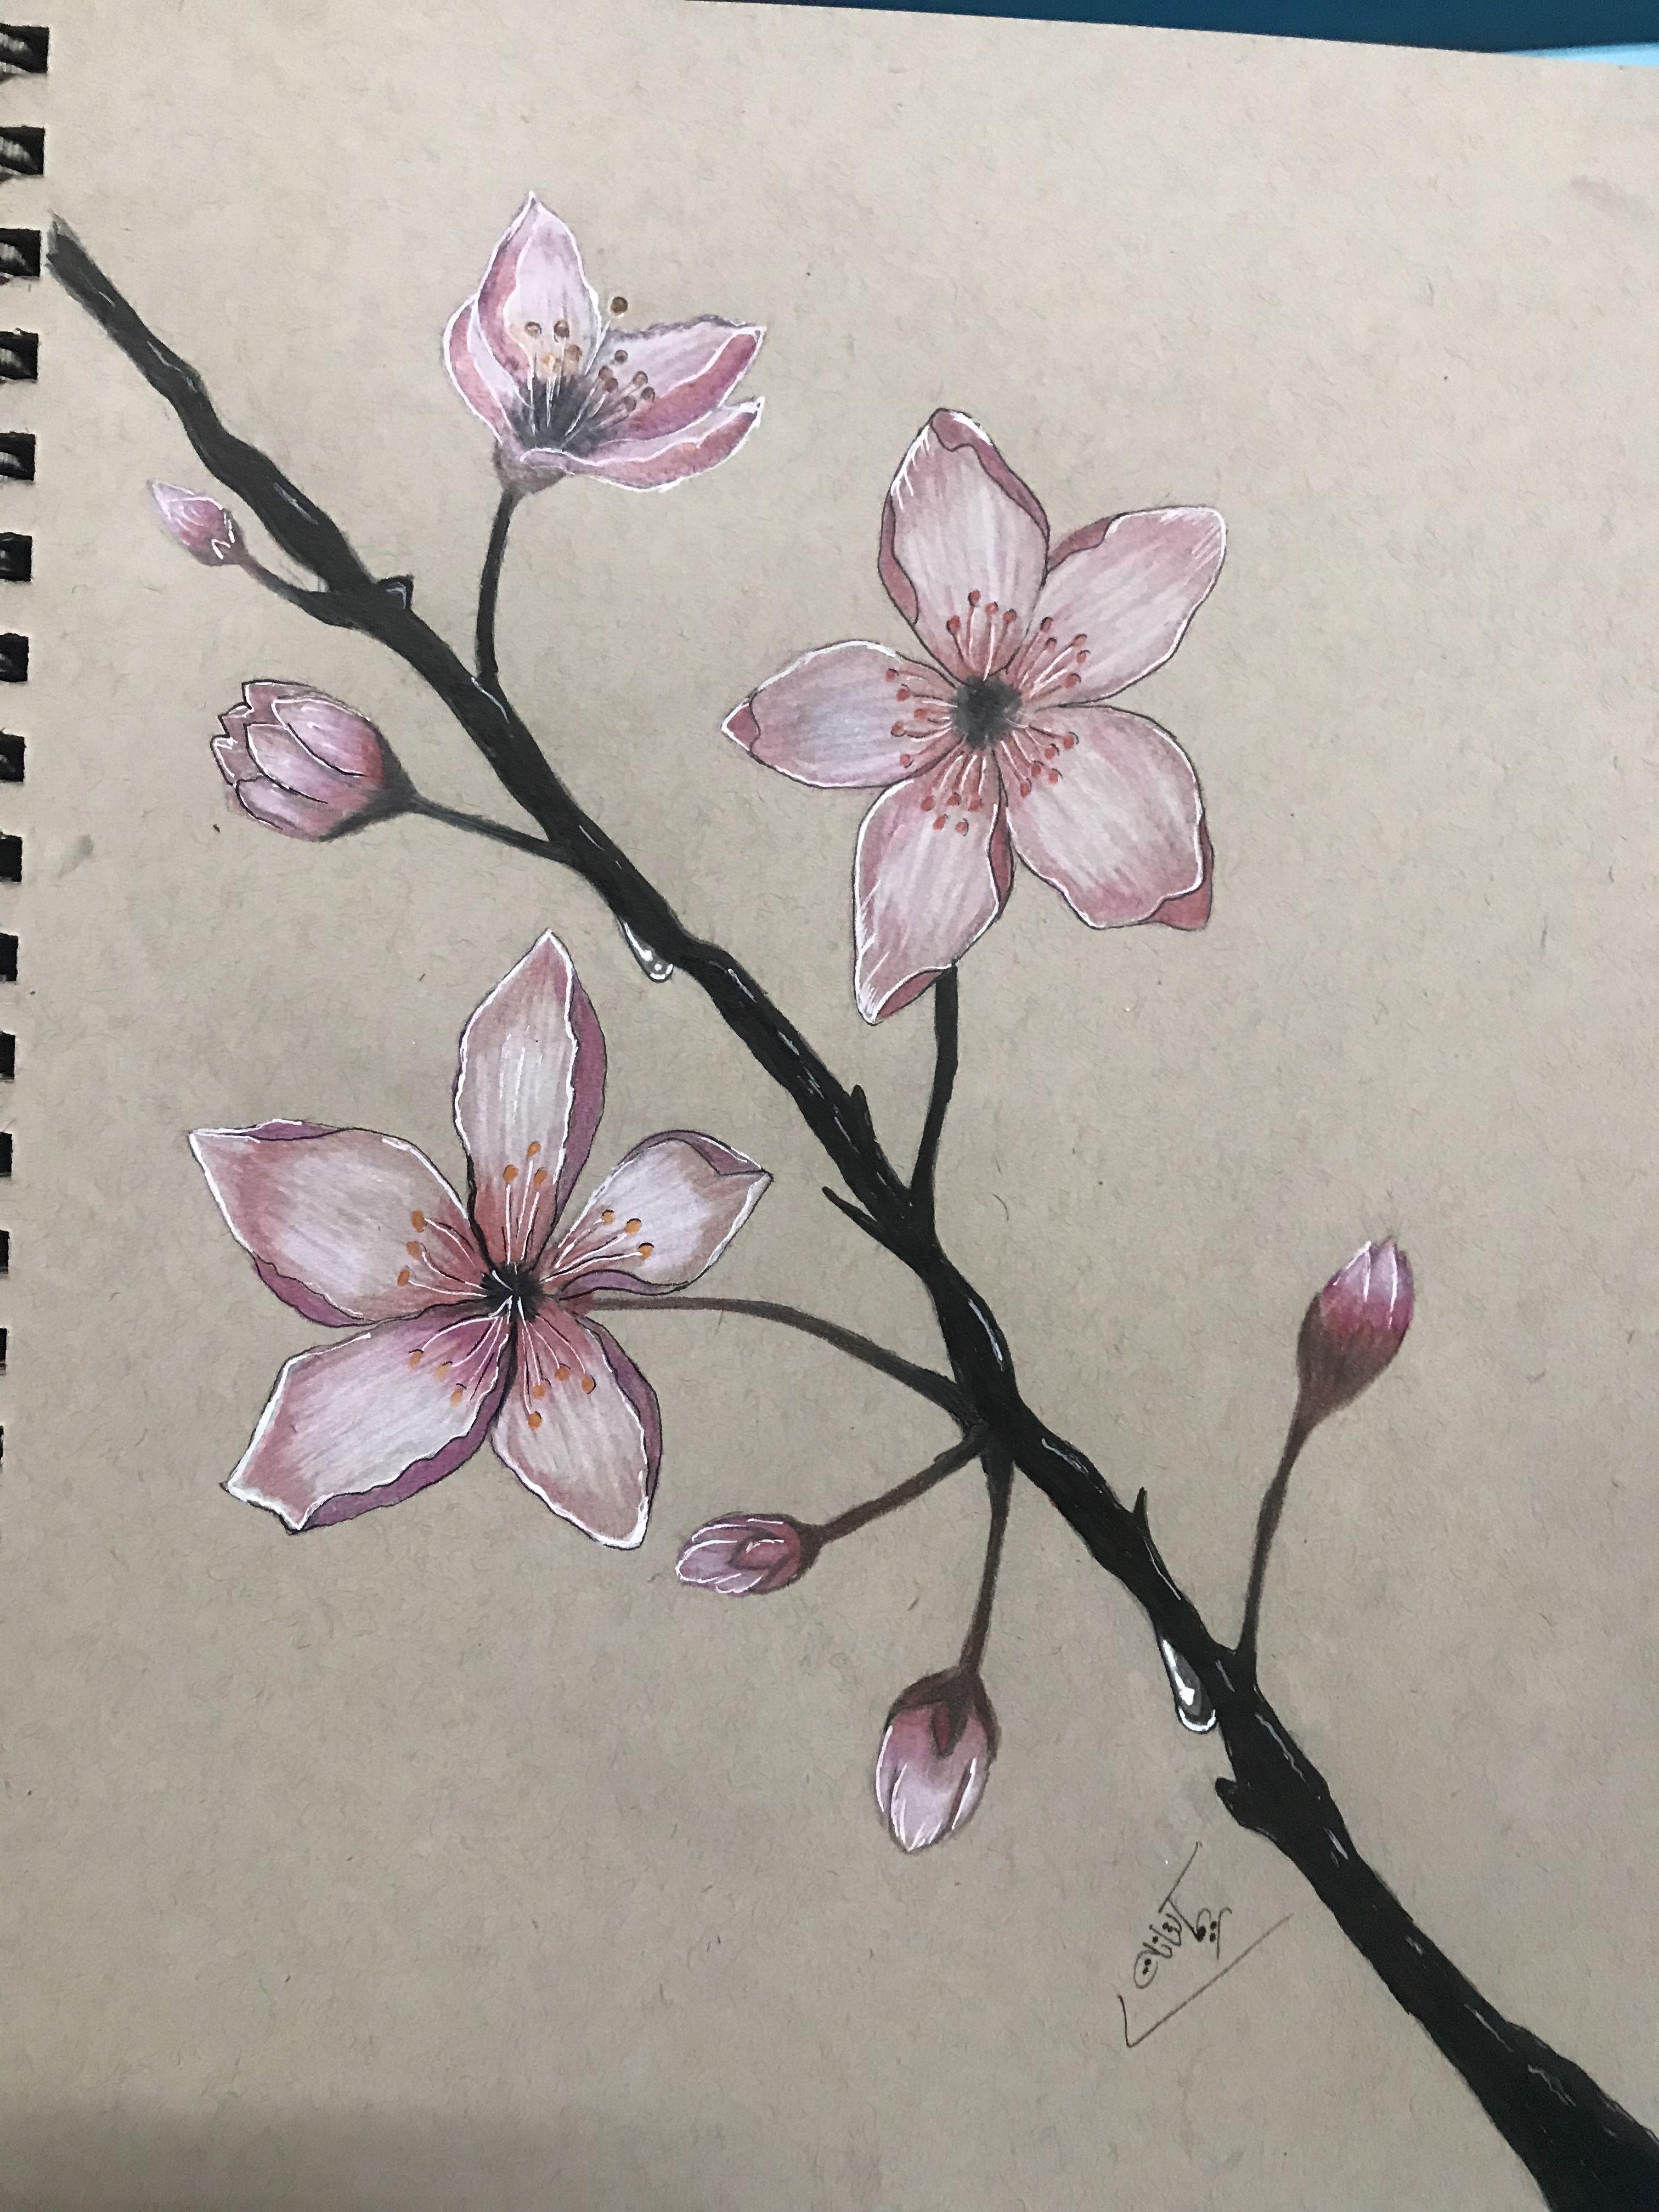 Drawing Draw Flowers ورد رسم Art Inspiration Drawing Procreate Ipad Art Art Drawings Simple